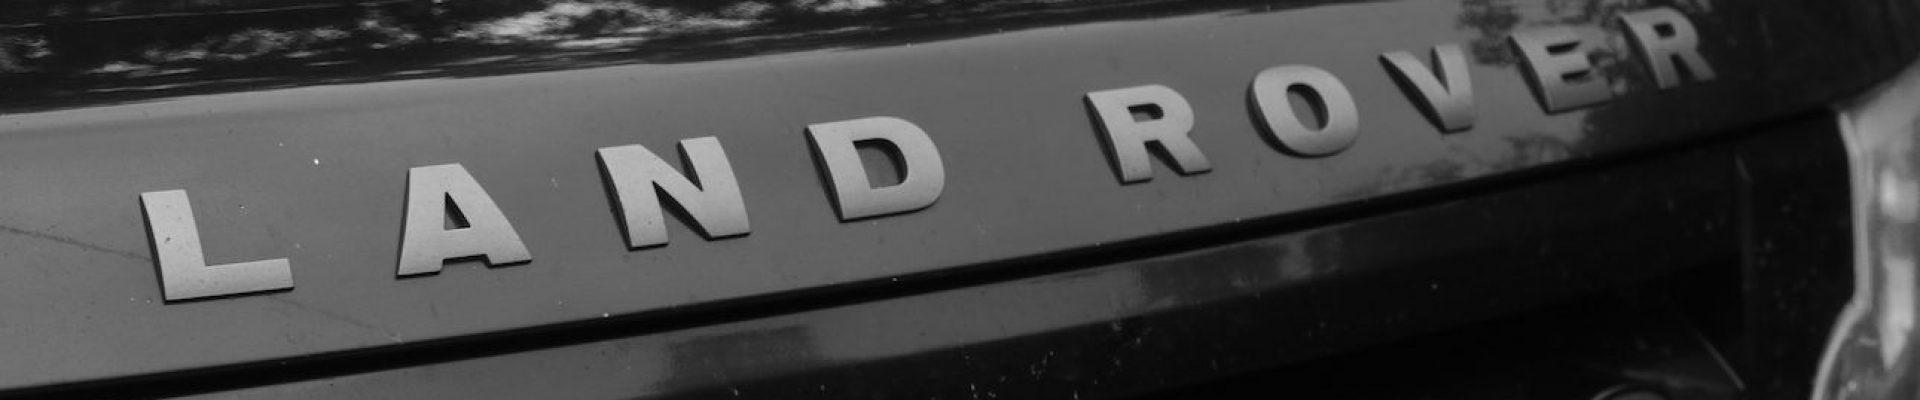 Land Rover banner 2